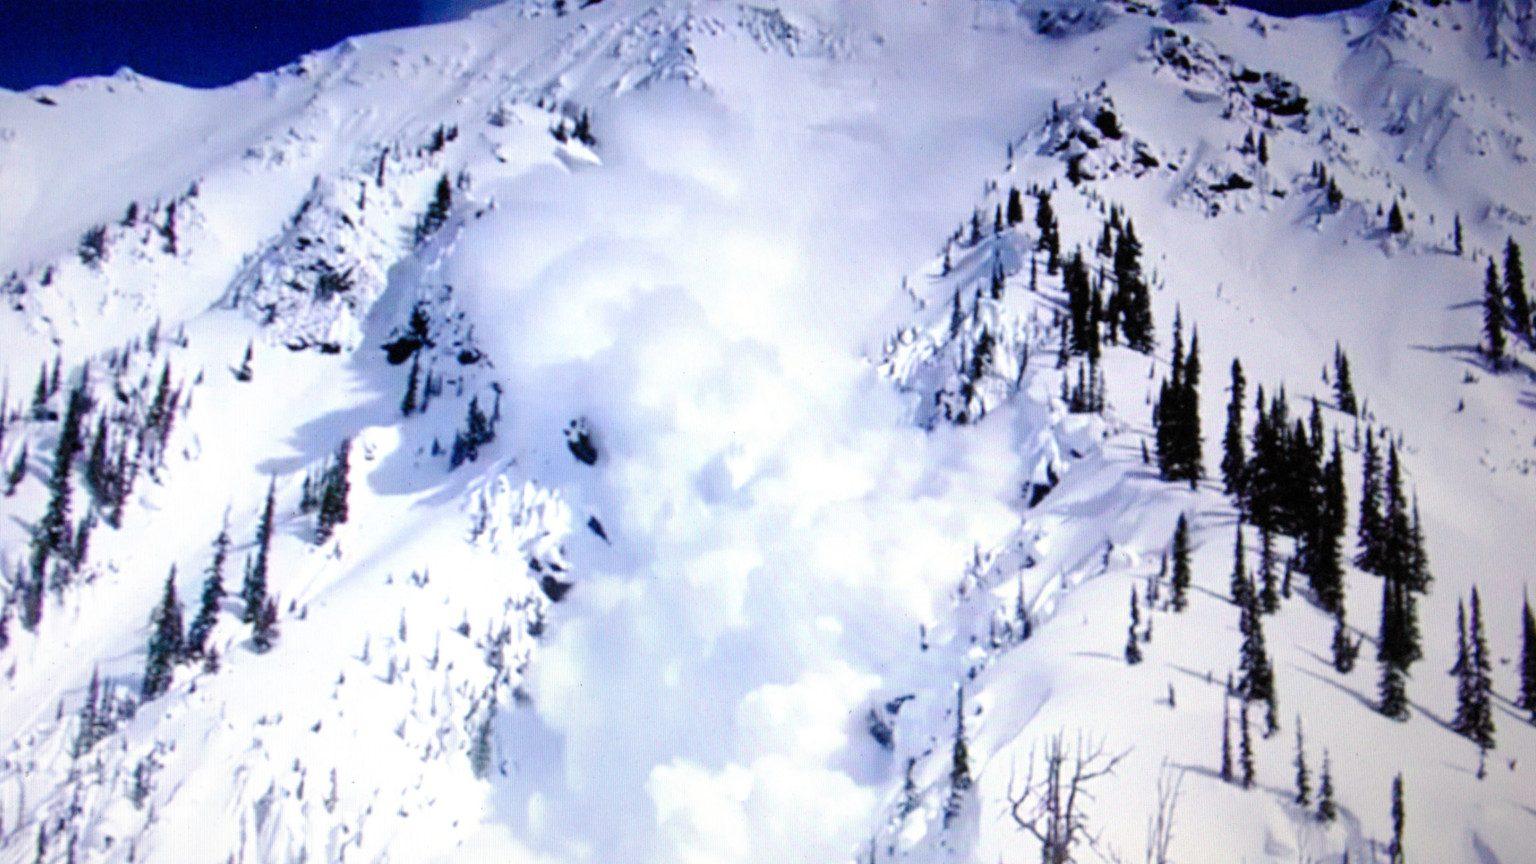 Snowy mountain avalanche